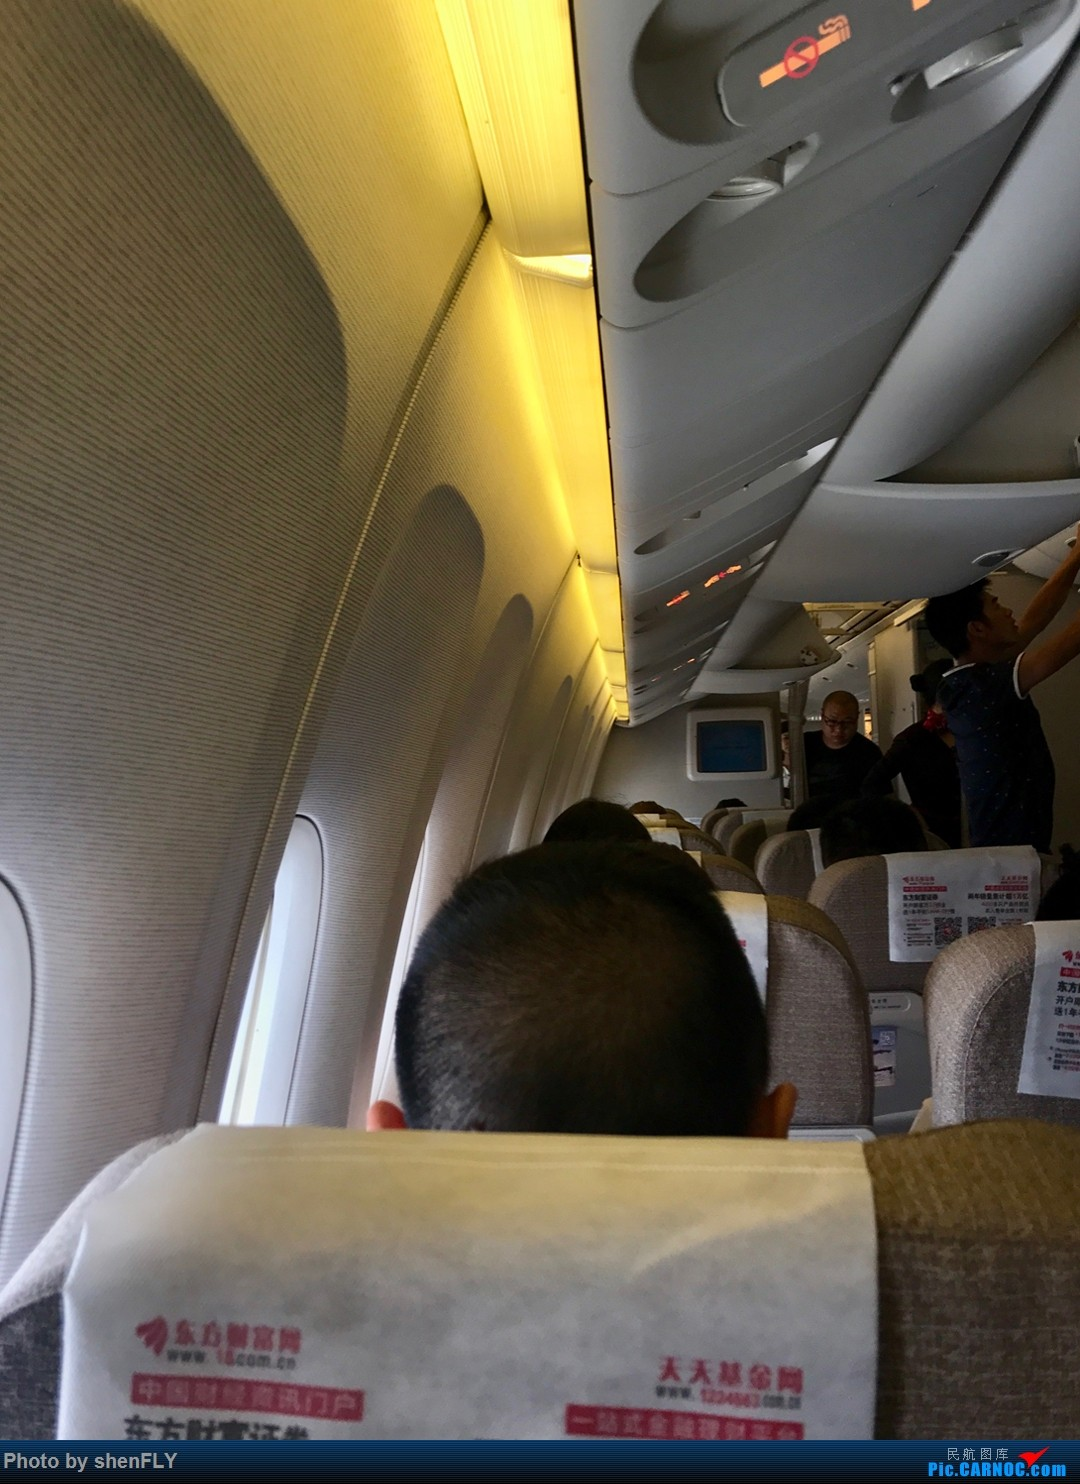 Re:[原创]【SAL B767-300ER B-2566】赶在退役前的最后飞行 BOEING 767-300ER B-2566 中国成都双流国际机场